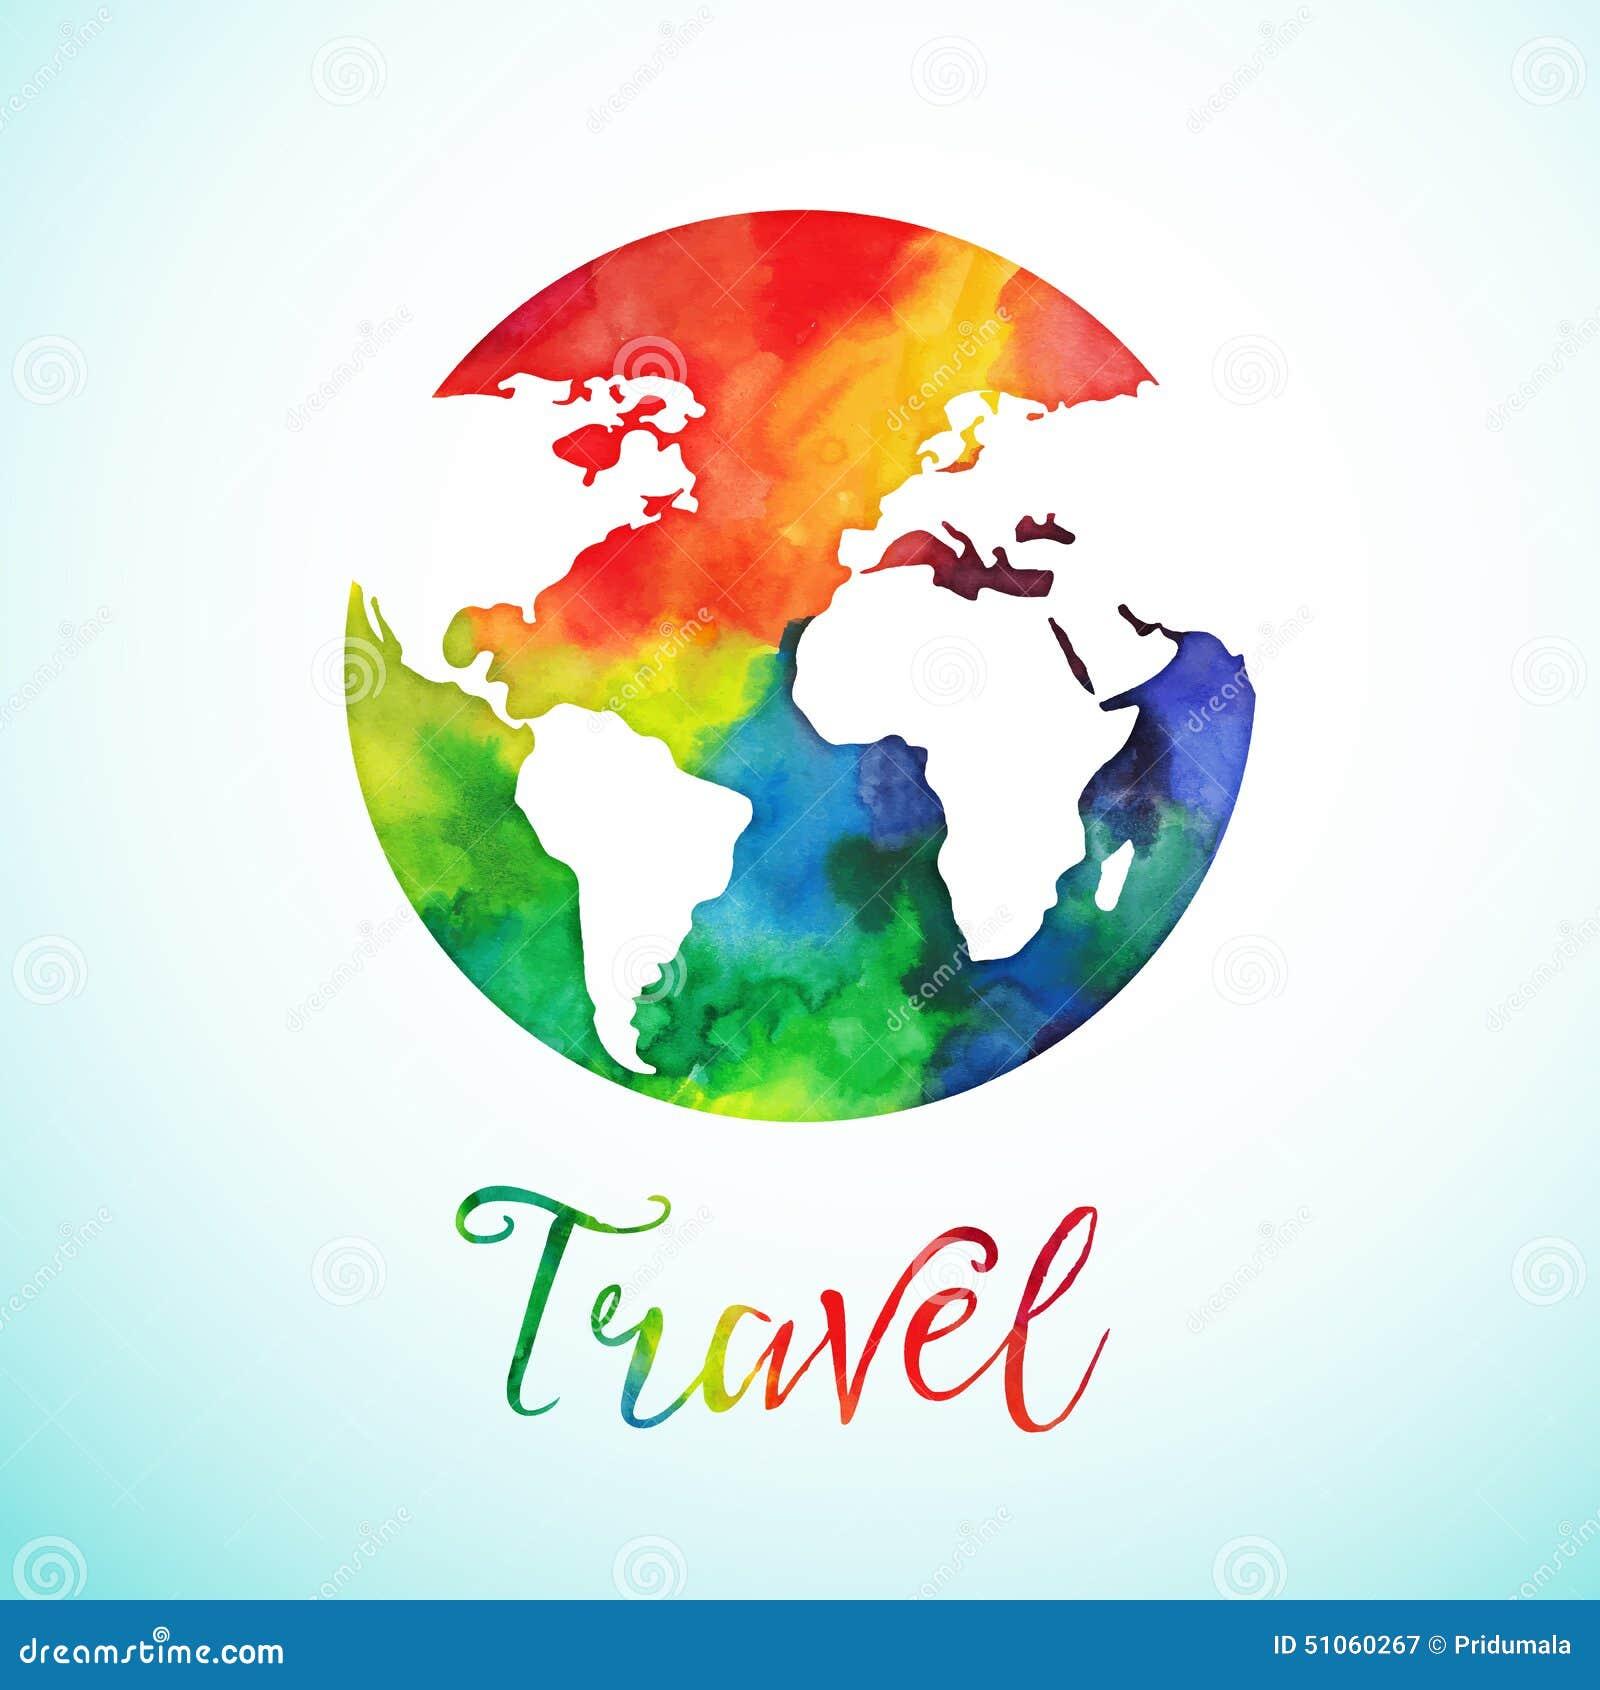 Vector watercolor globe sphere, map design. Travel background calligraphy badge